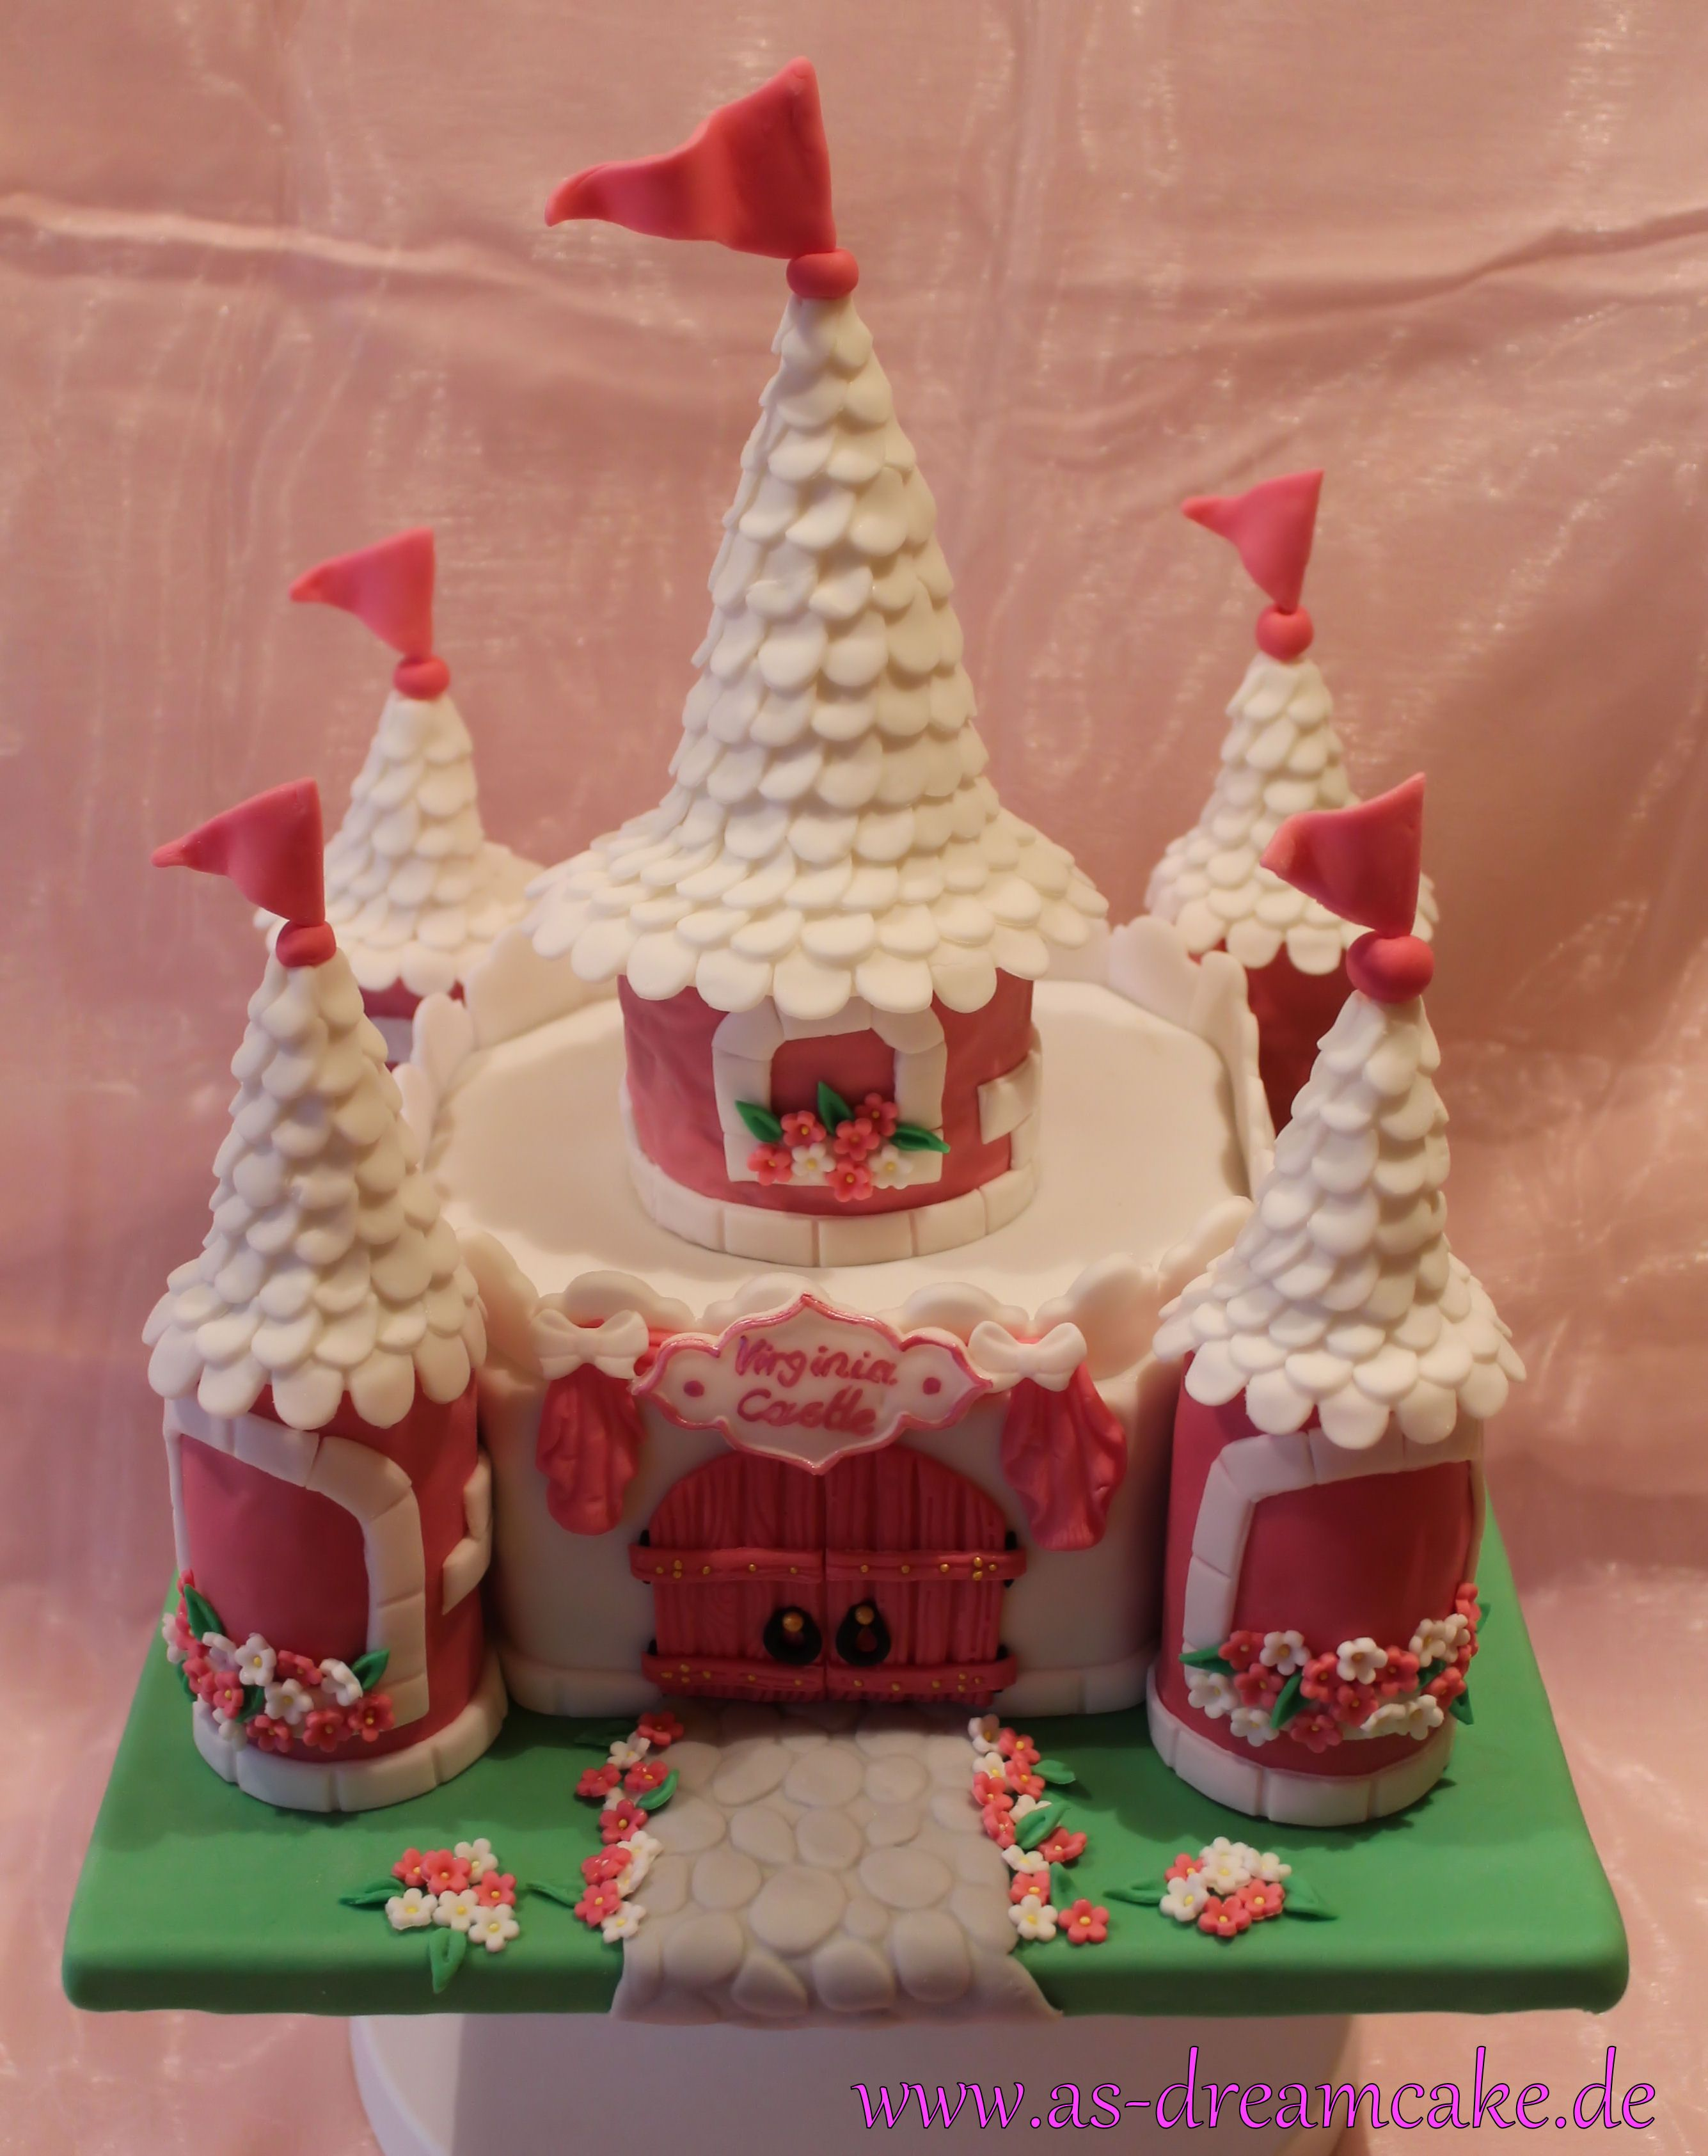 Prinzessinnen Schloss Torte Meine Tortenkreationen Pinterest